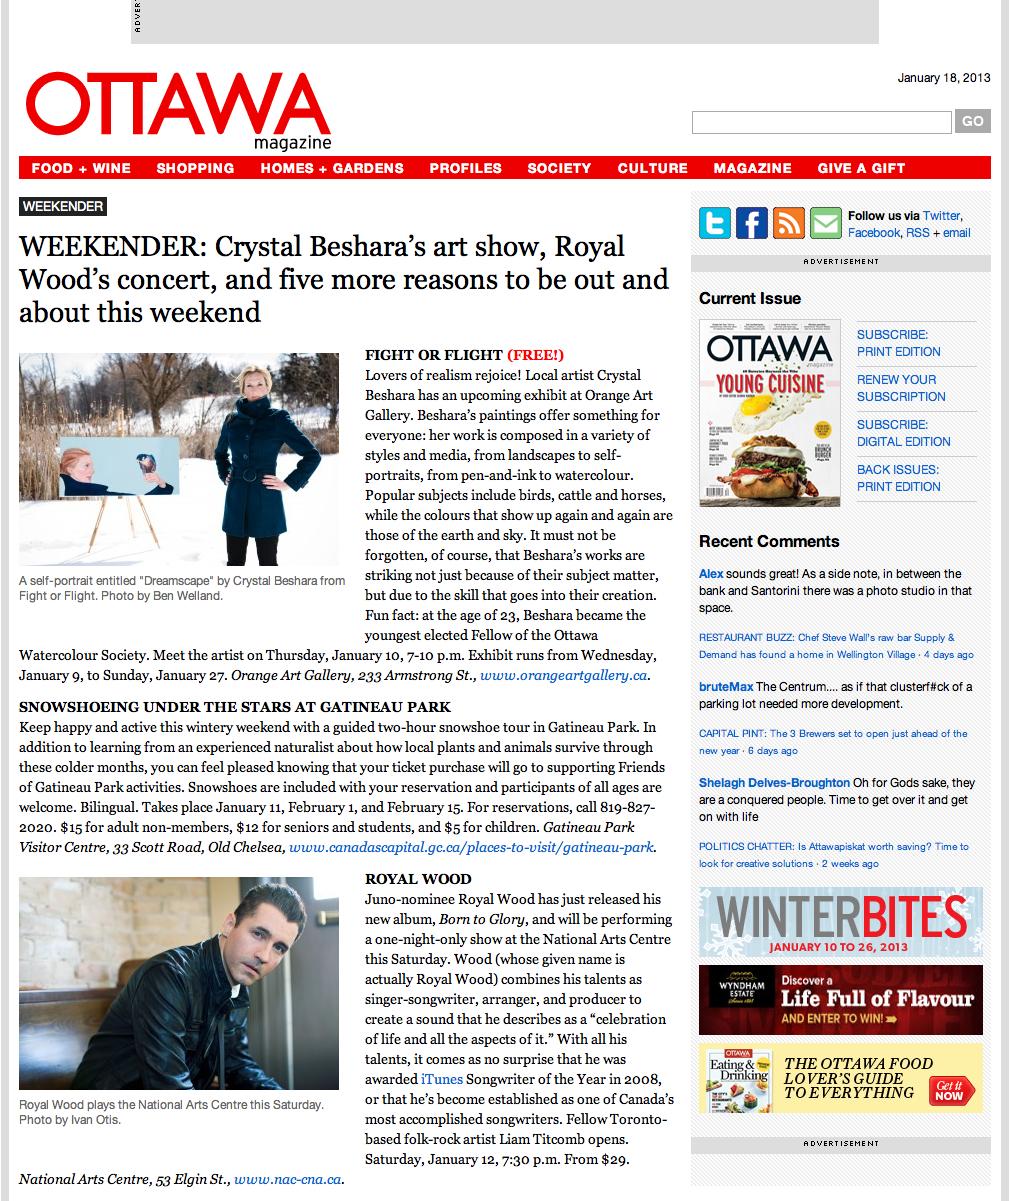 Ottawa Magazine Jan 18 2013.jpg